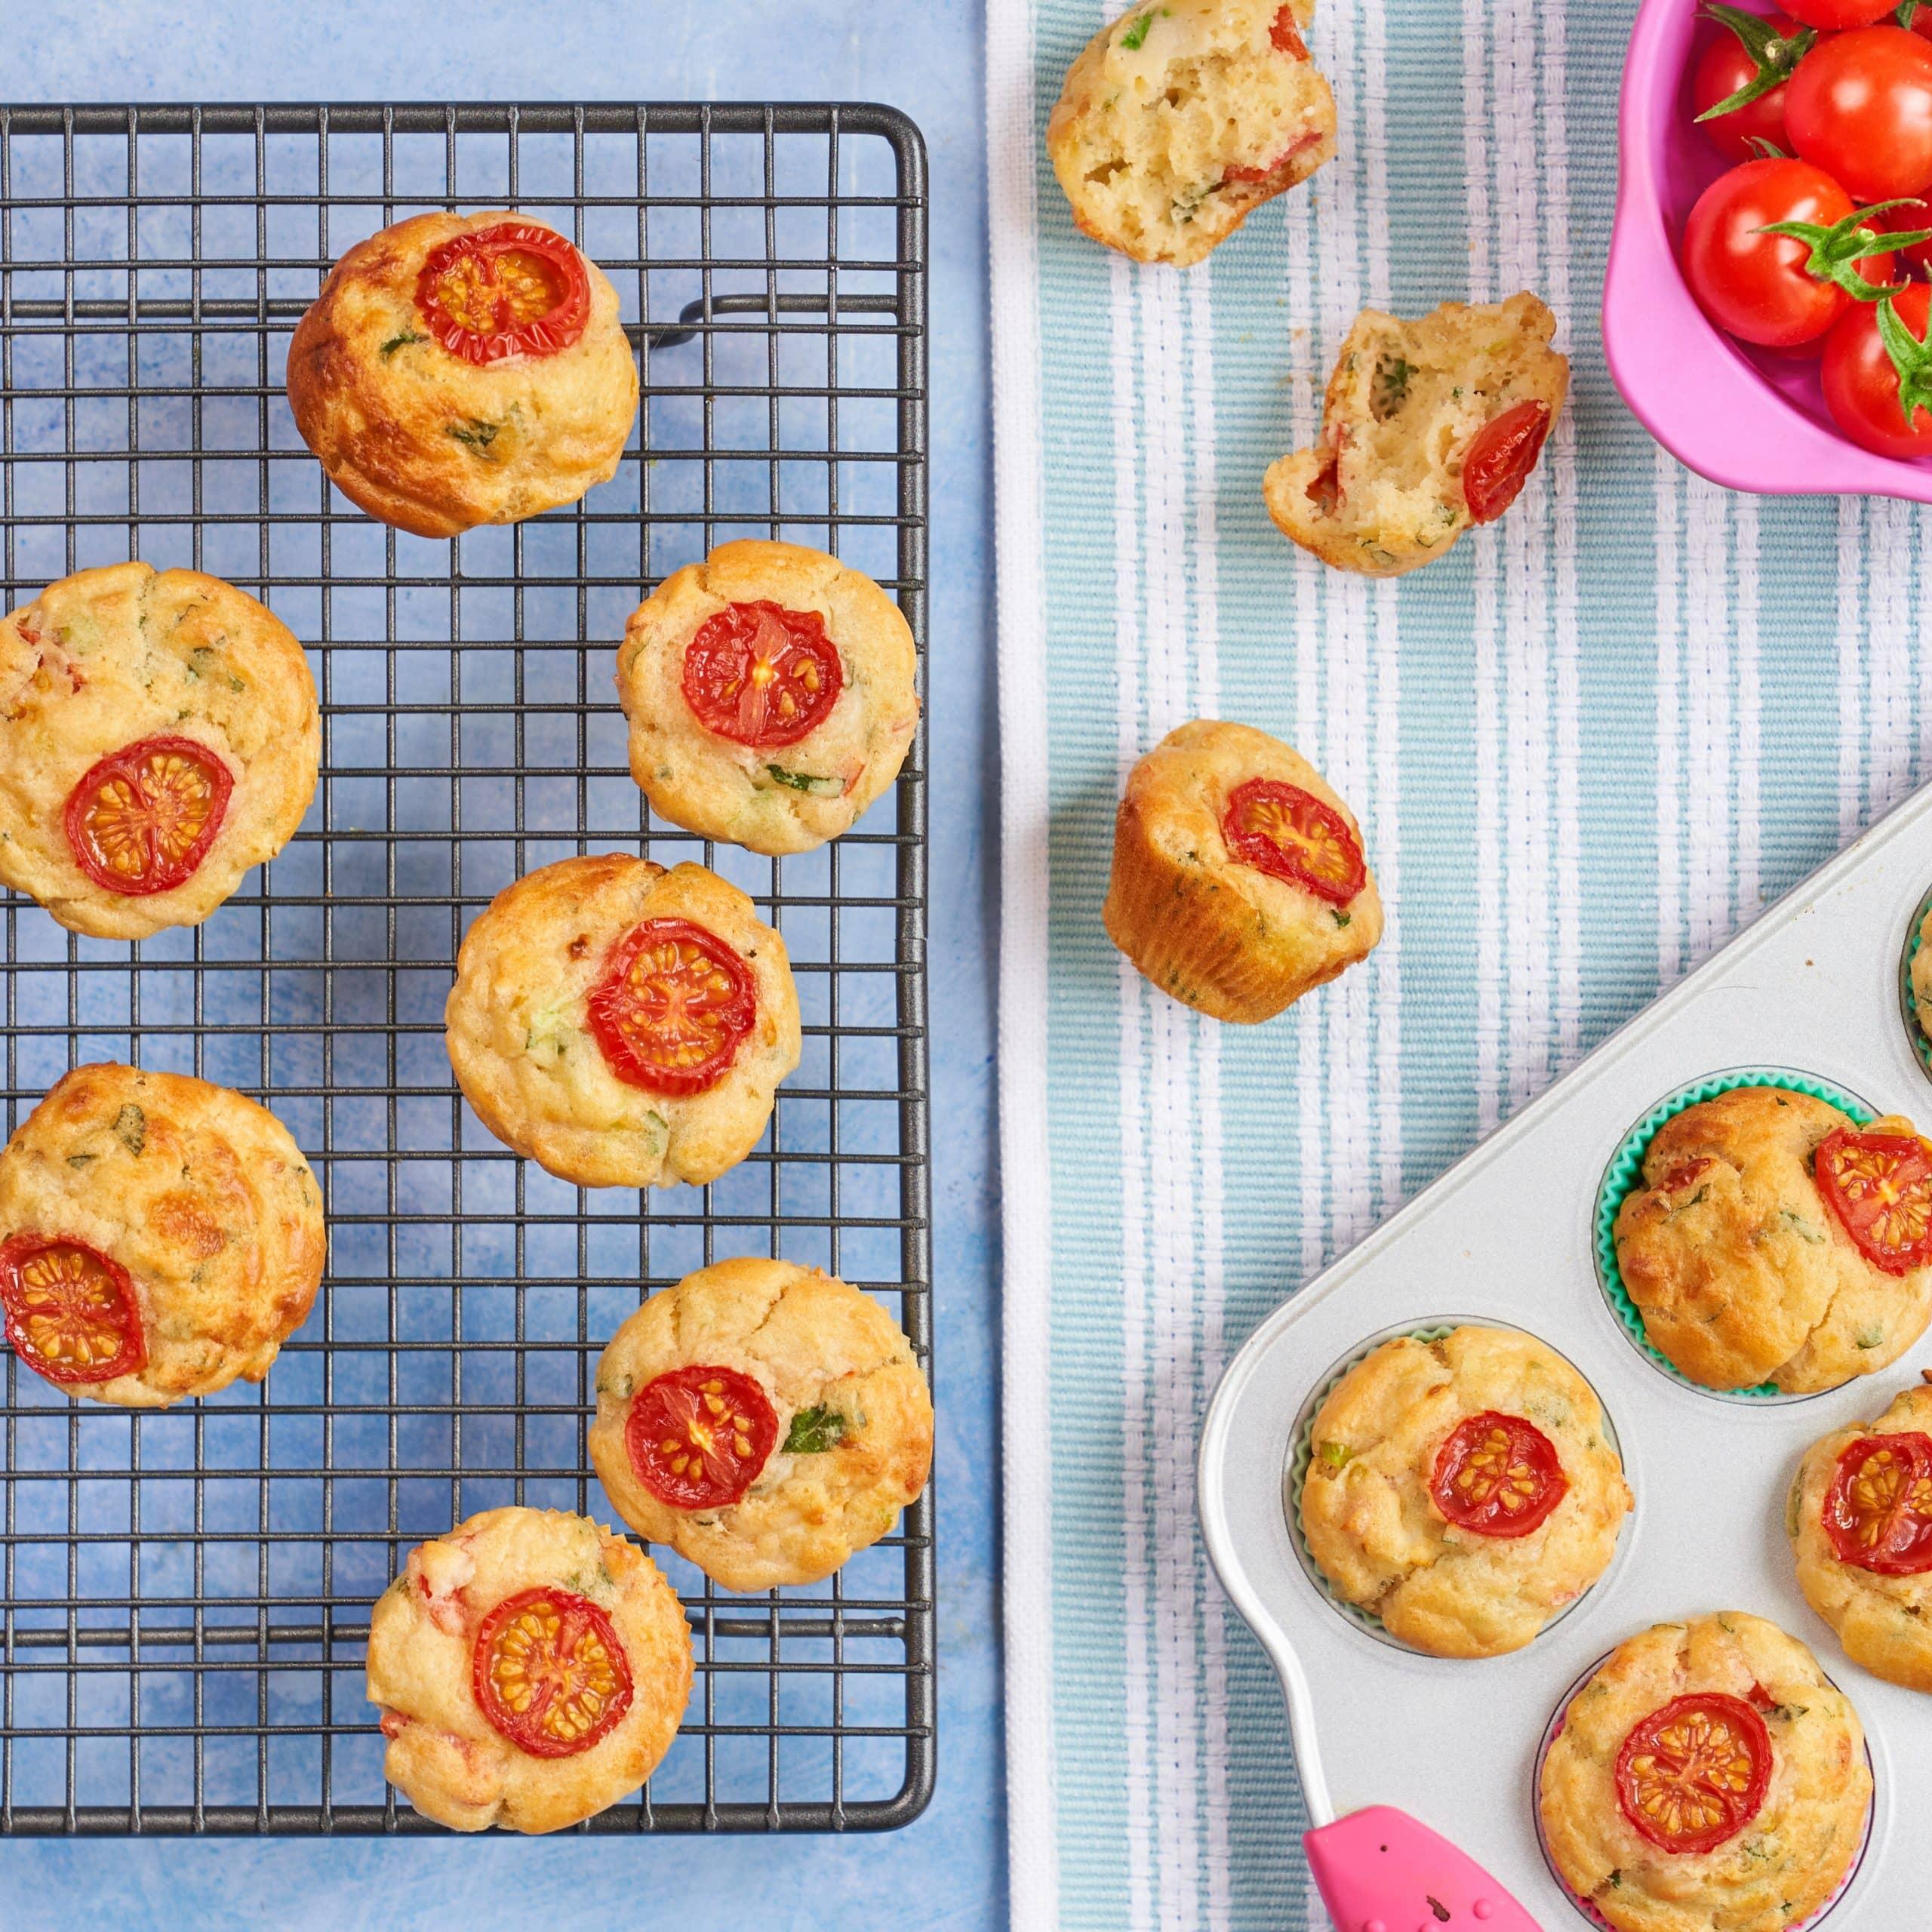 Mini Cheese & Cherry Tomato Muffins recipe by Annabel Karmel